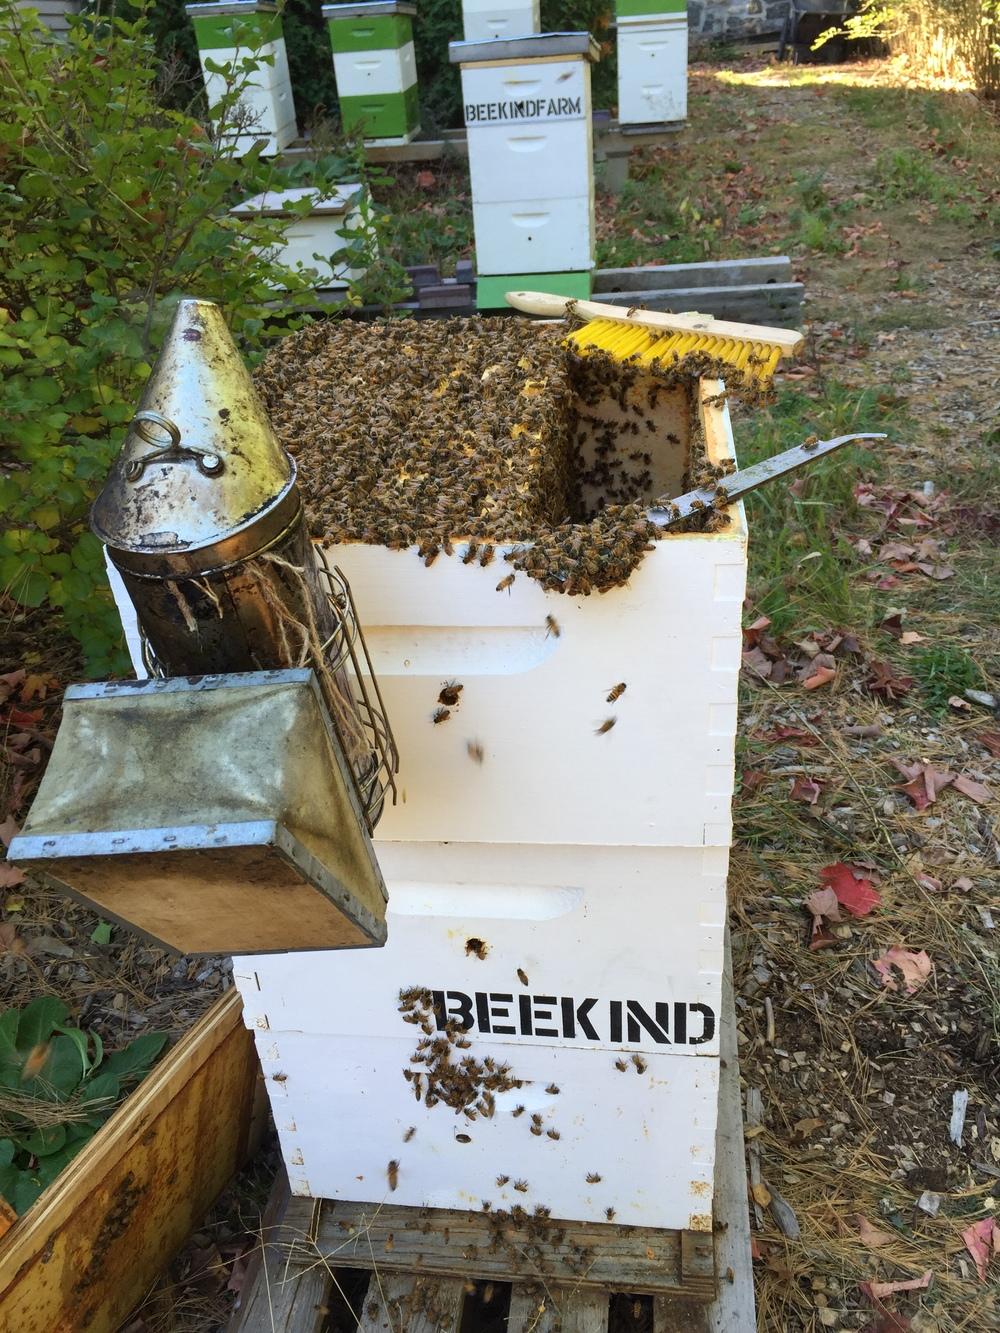 A Bee Yard in Greenwich, CT